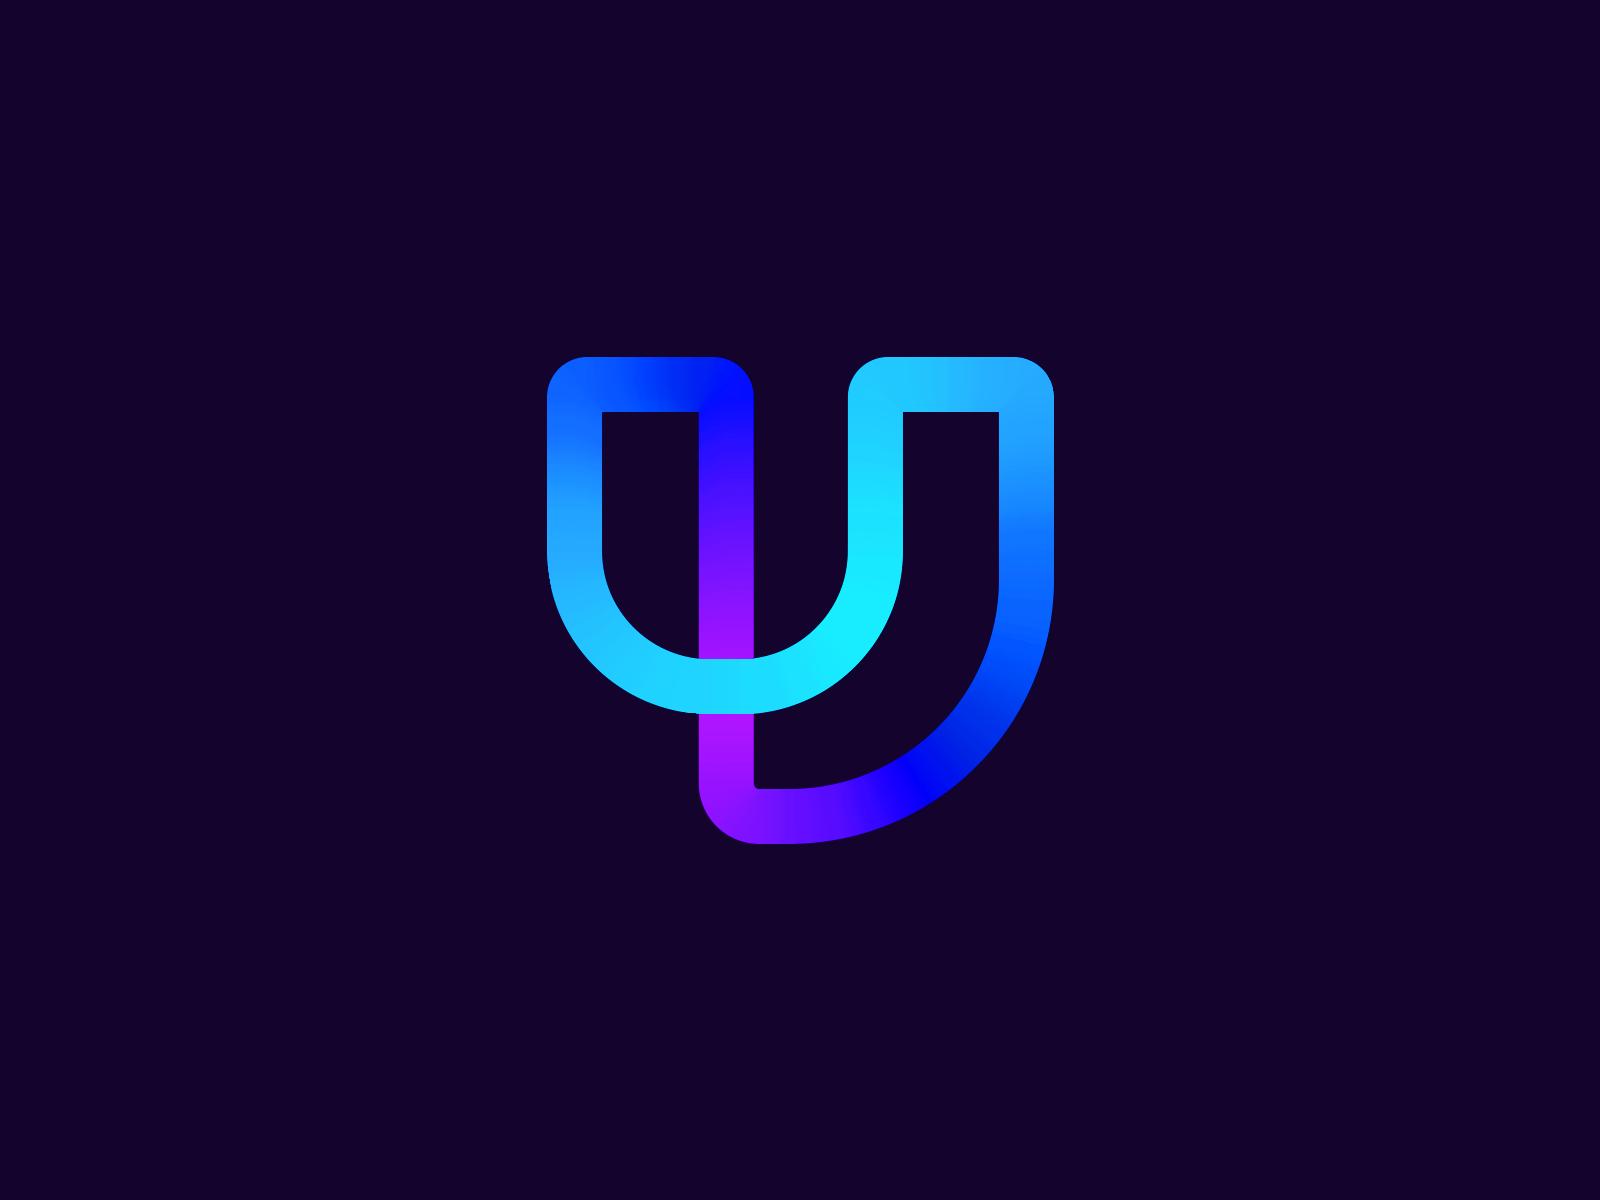 UJ Logo monogram creative blue icon design logo logo designer smart logo logo icon clever logo branding identity graphic design j u u logo j logo gradients gradient logo design